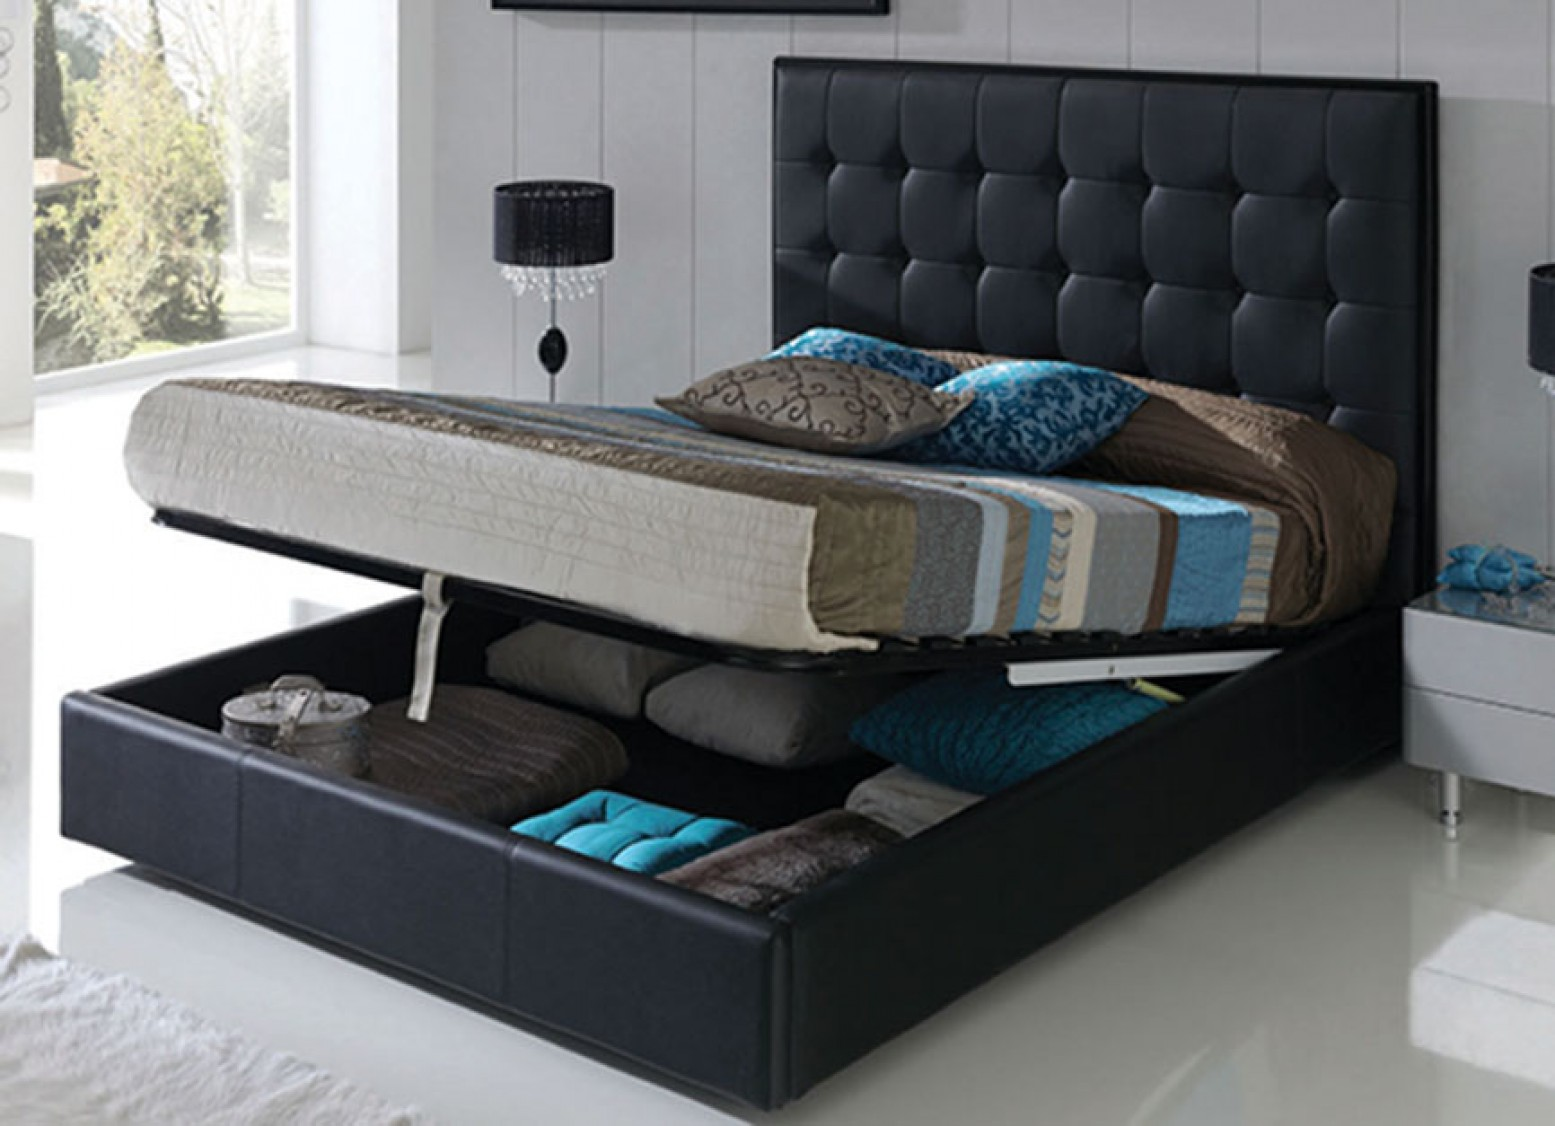 Penelope 622 King Size Storage Bed With Folding Frame Black Buy Online At Best Price